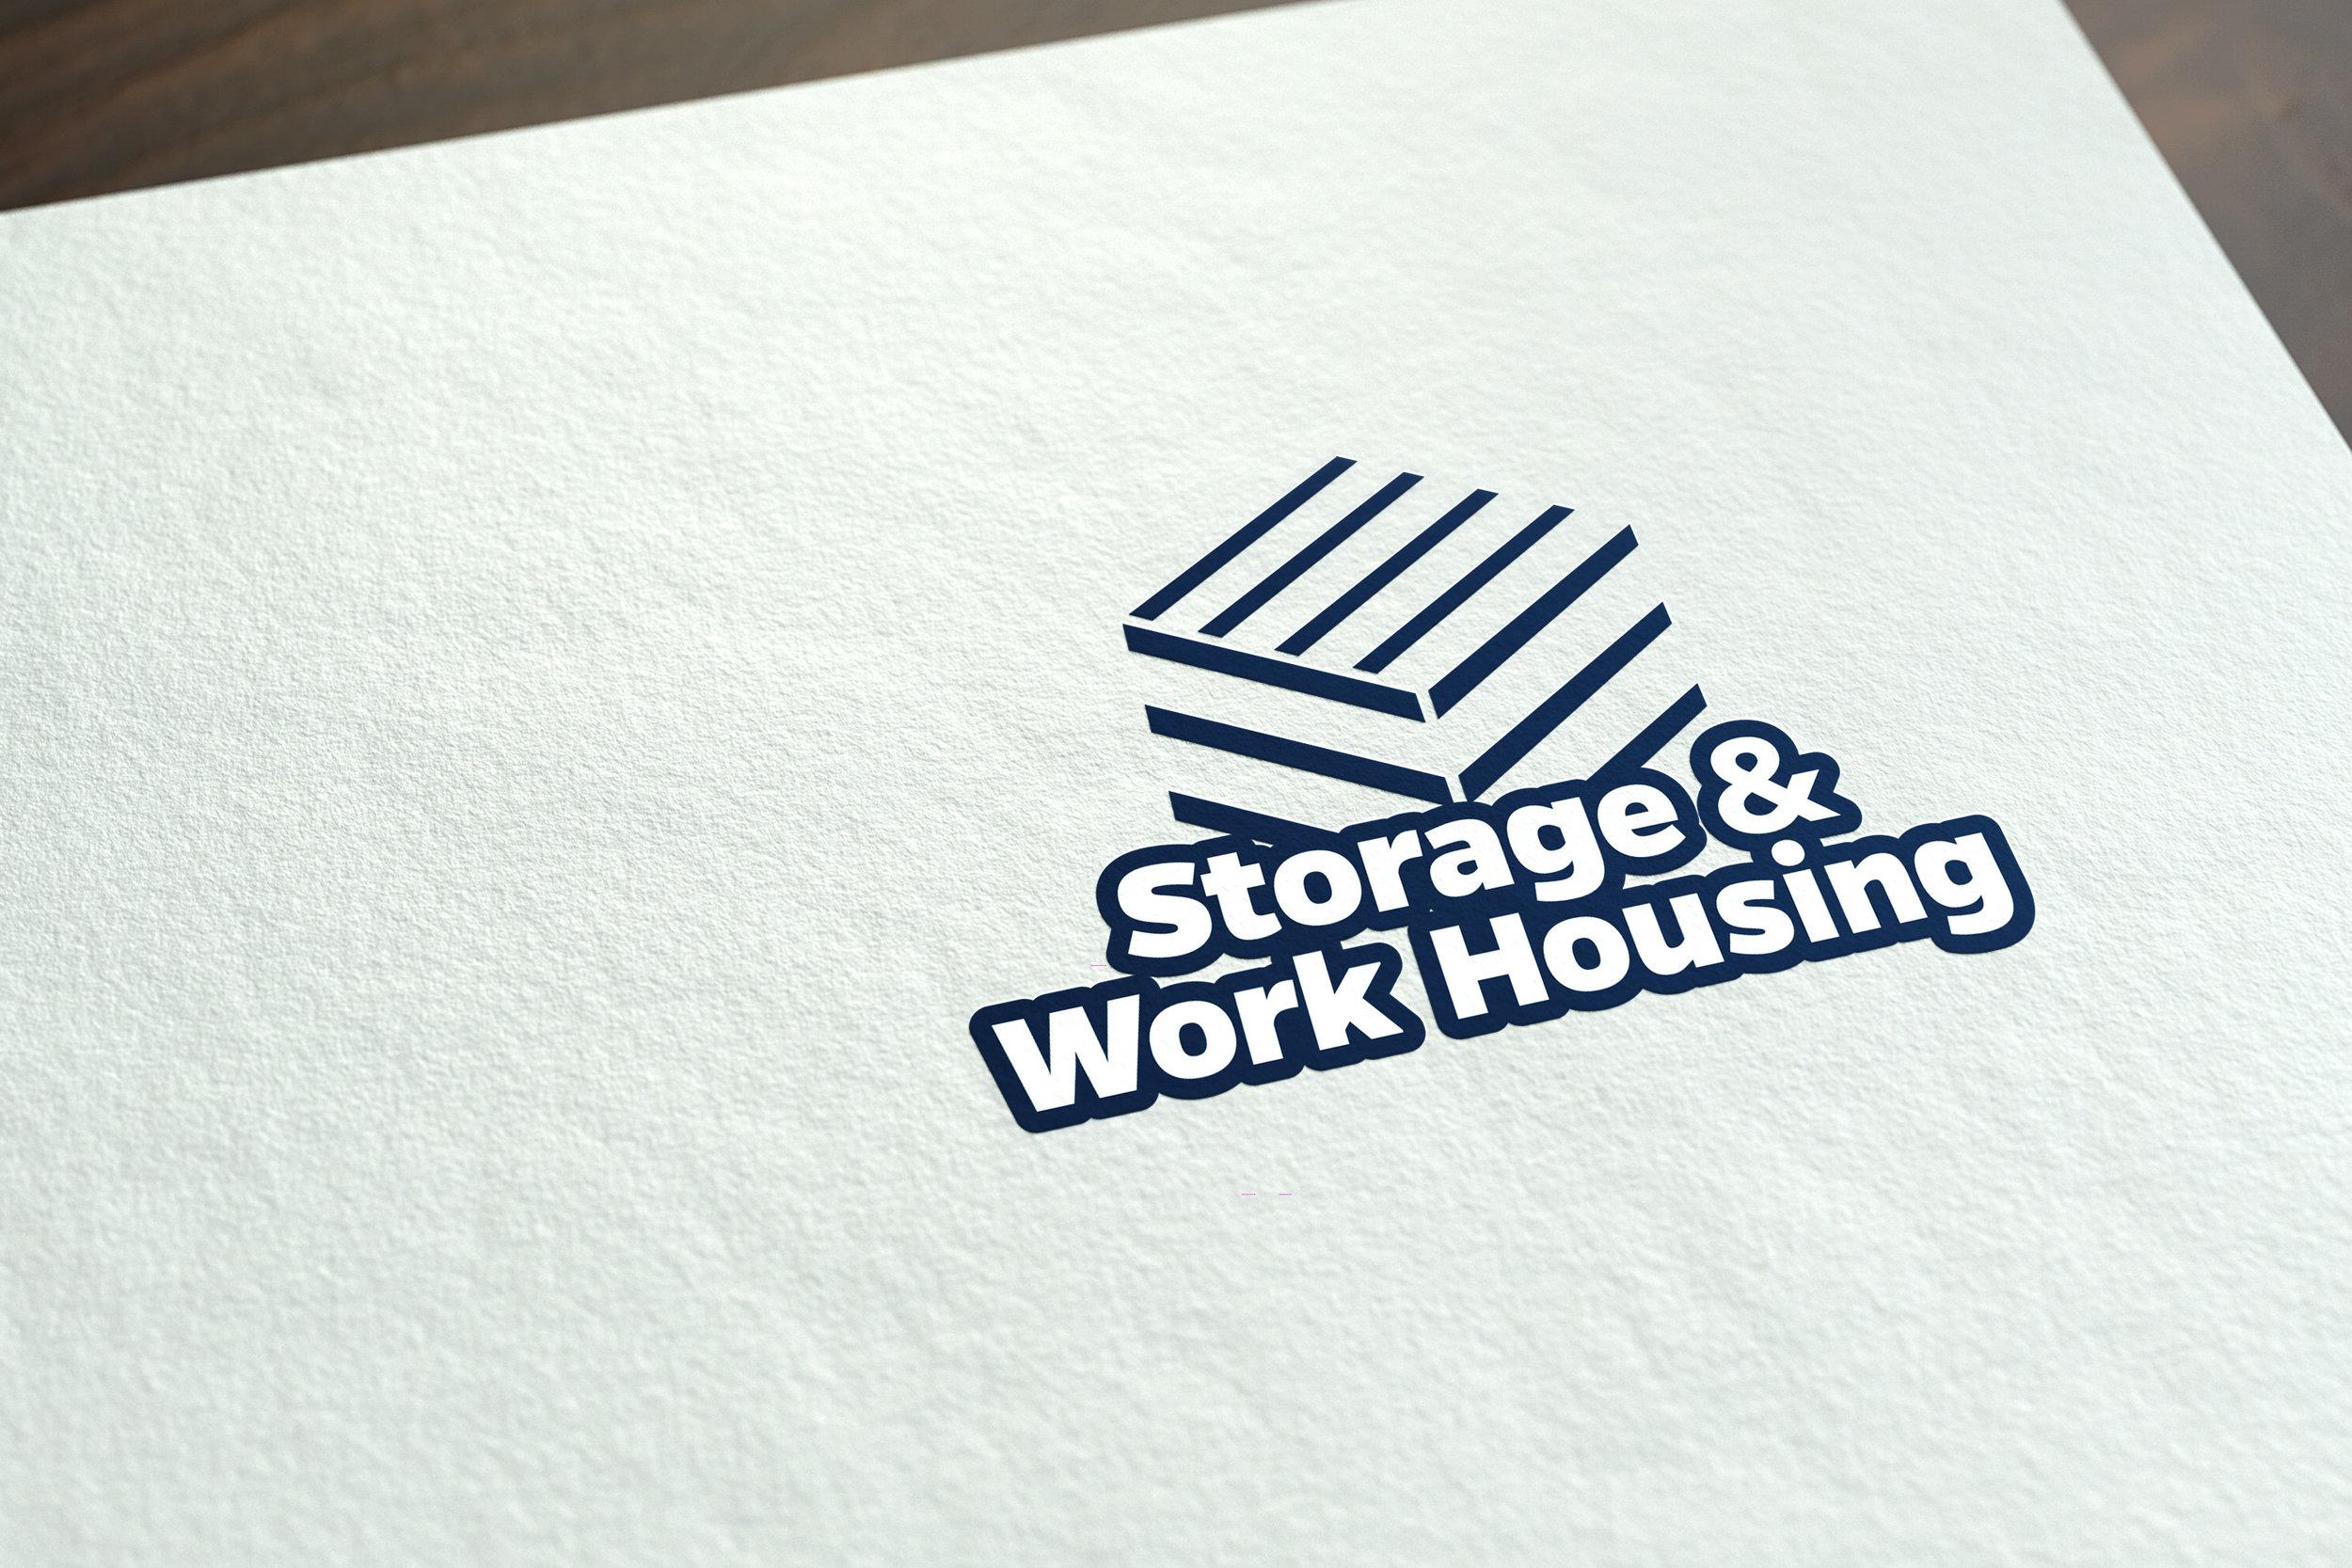 storage and work housing.jpg